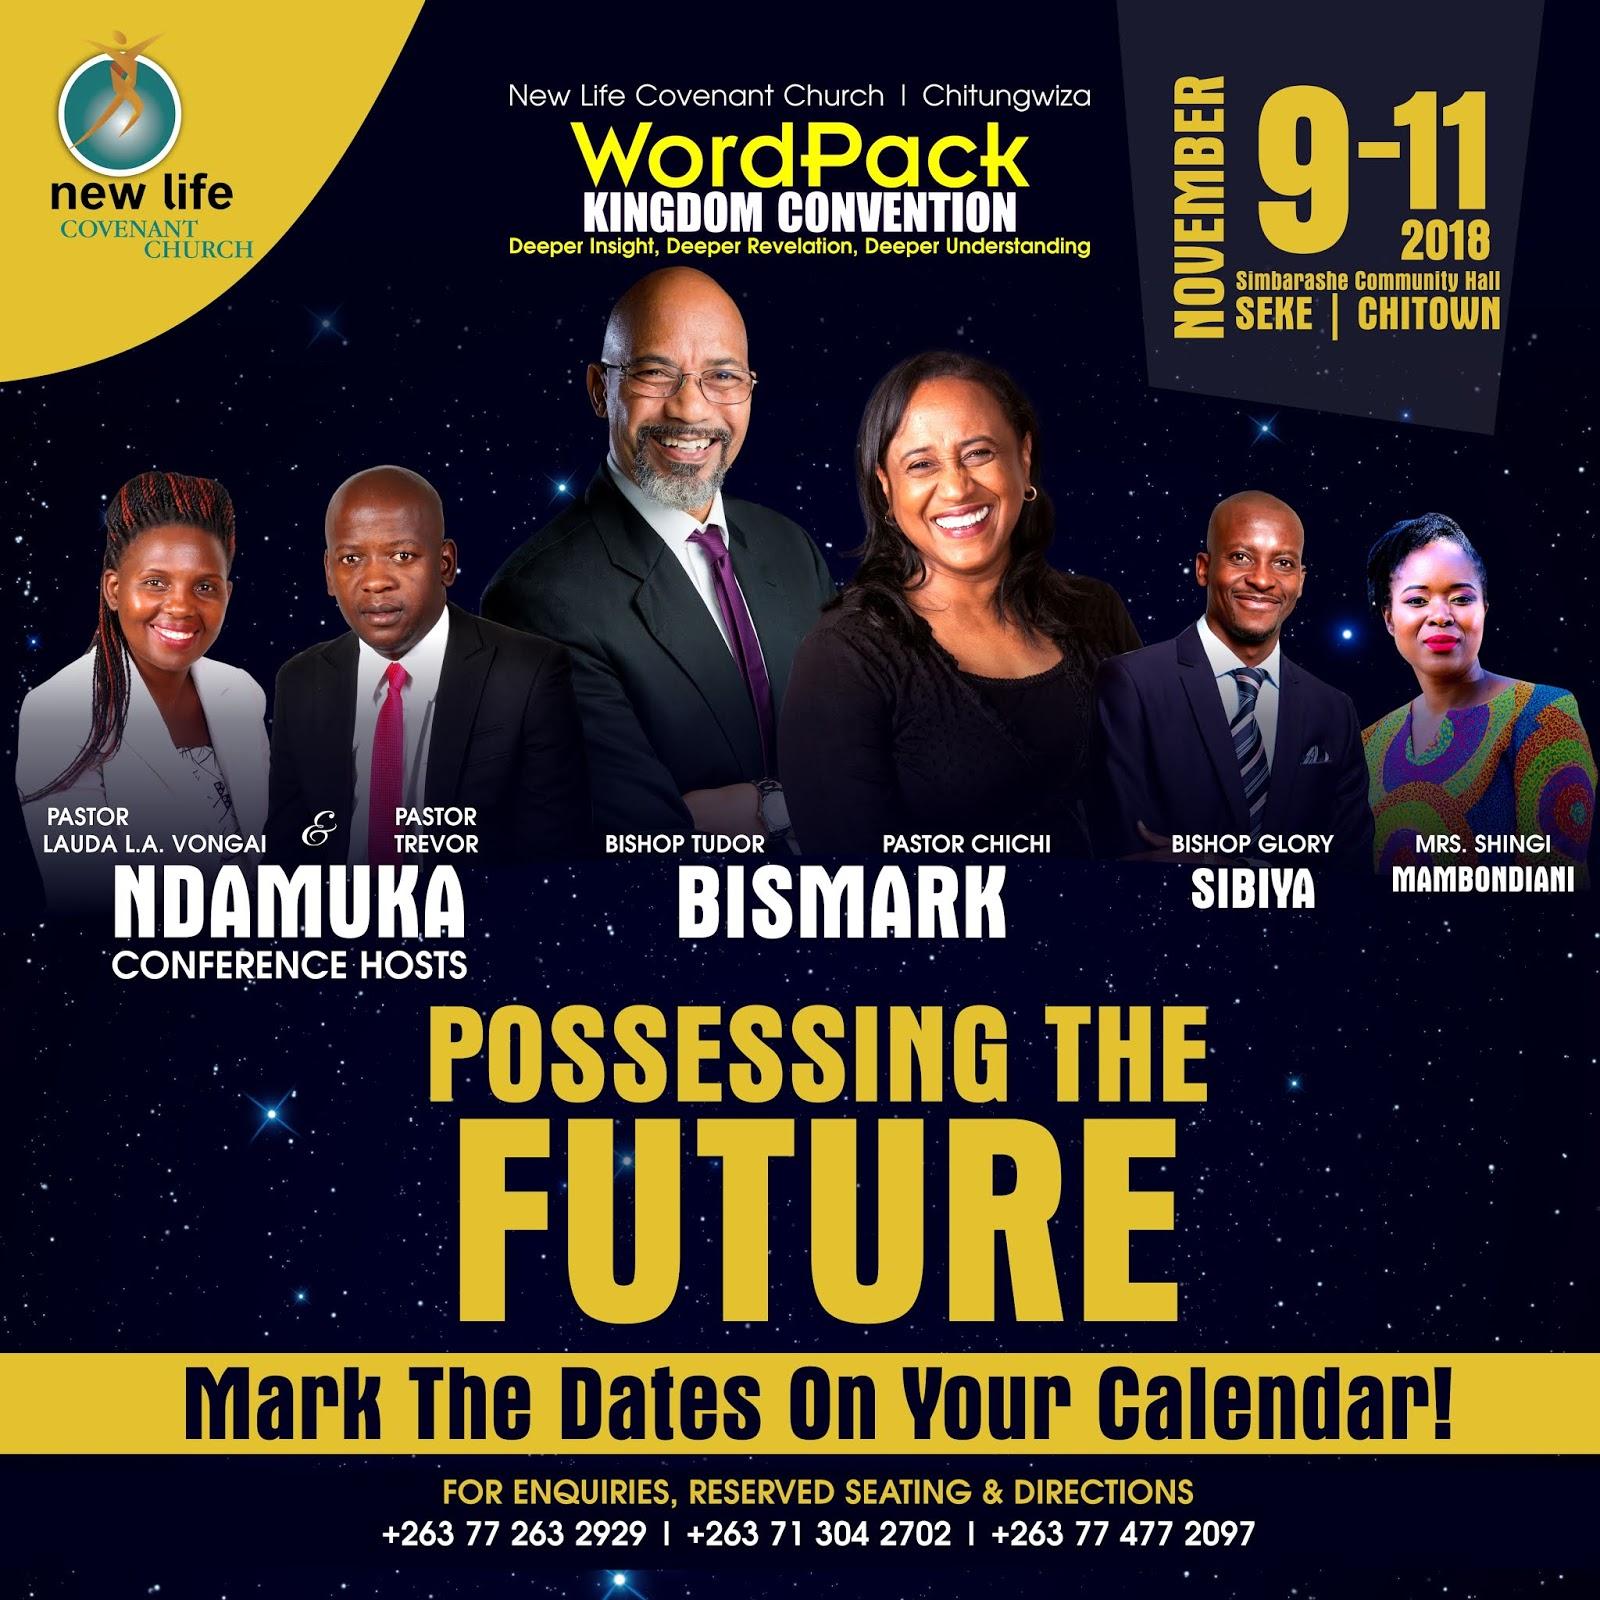 Bishop Tudor Bismark For Chitungwiza WordPack Kingdom Convention 2018